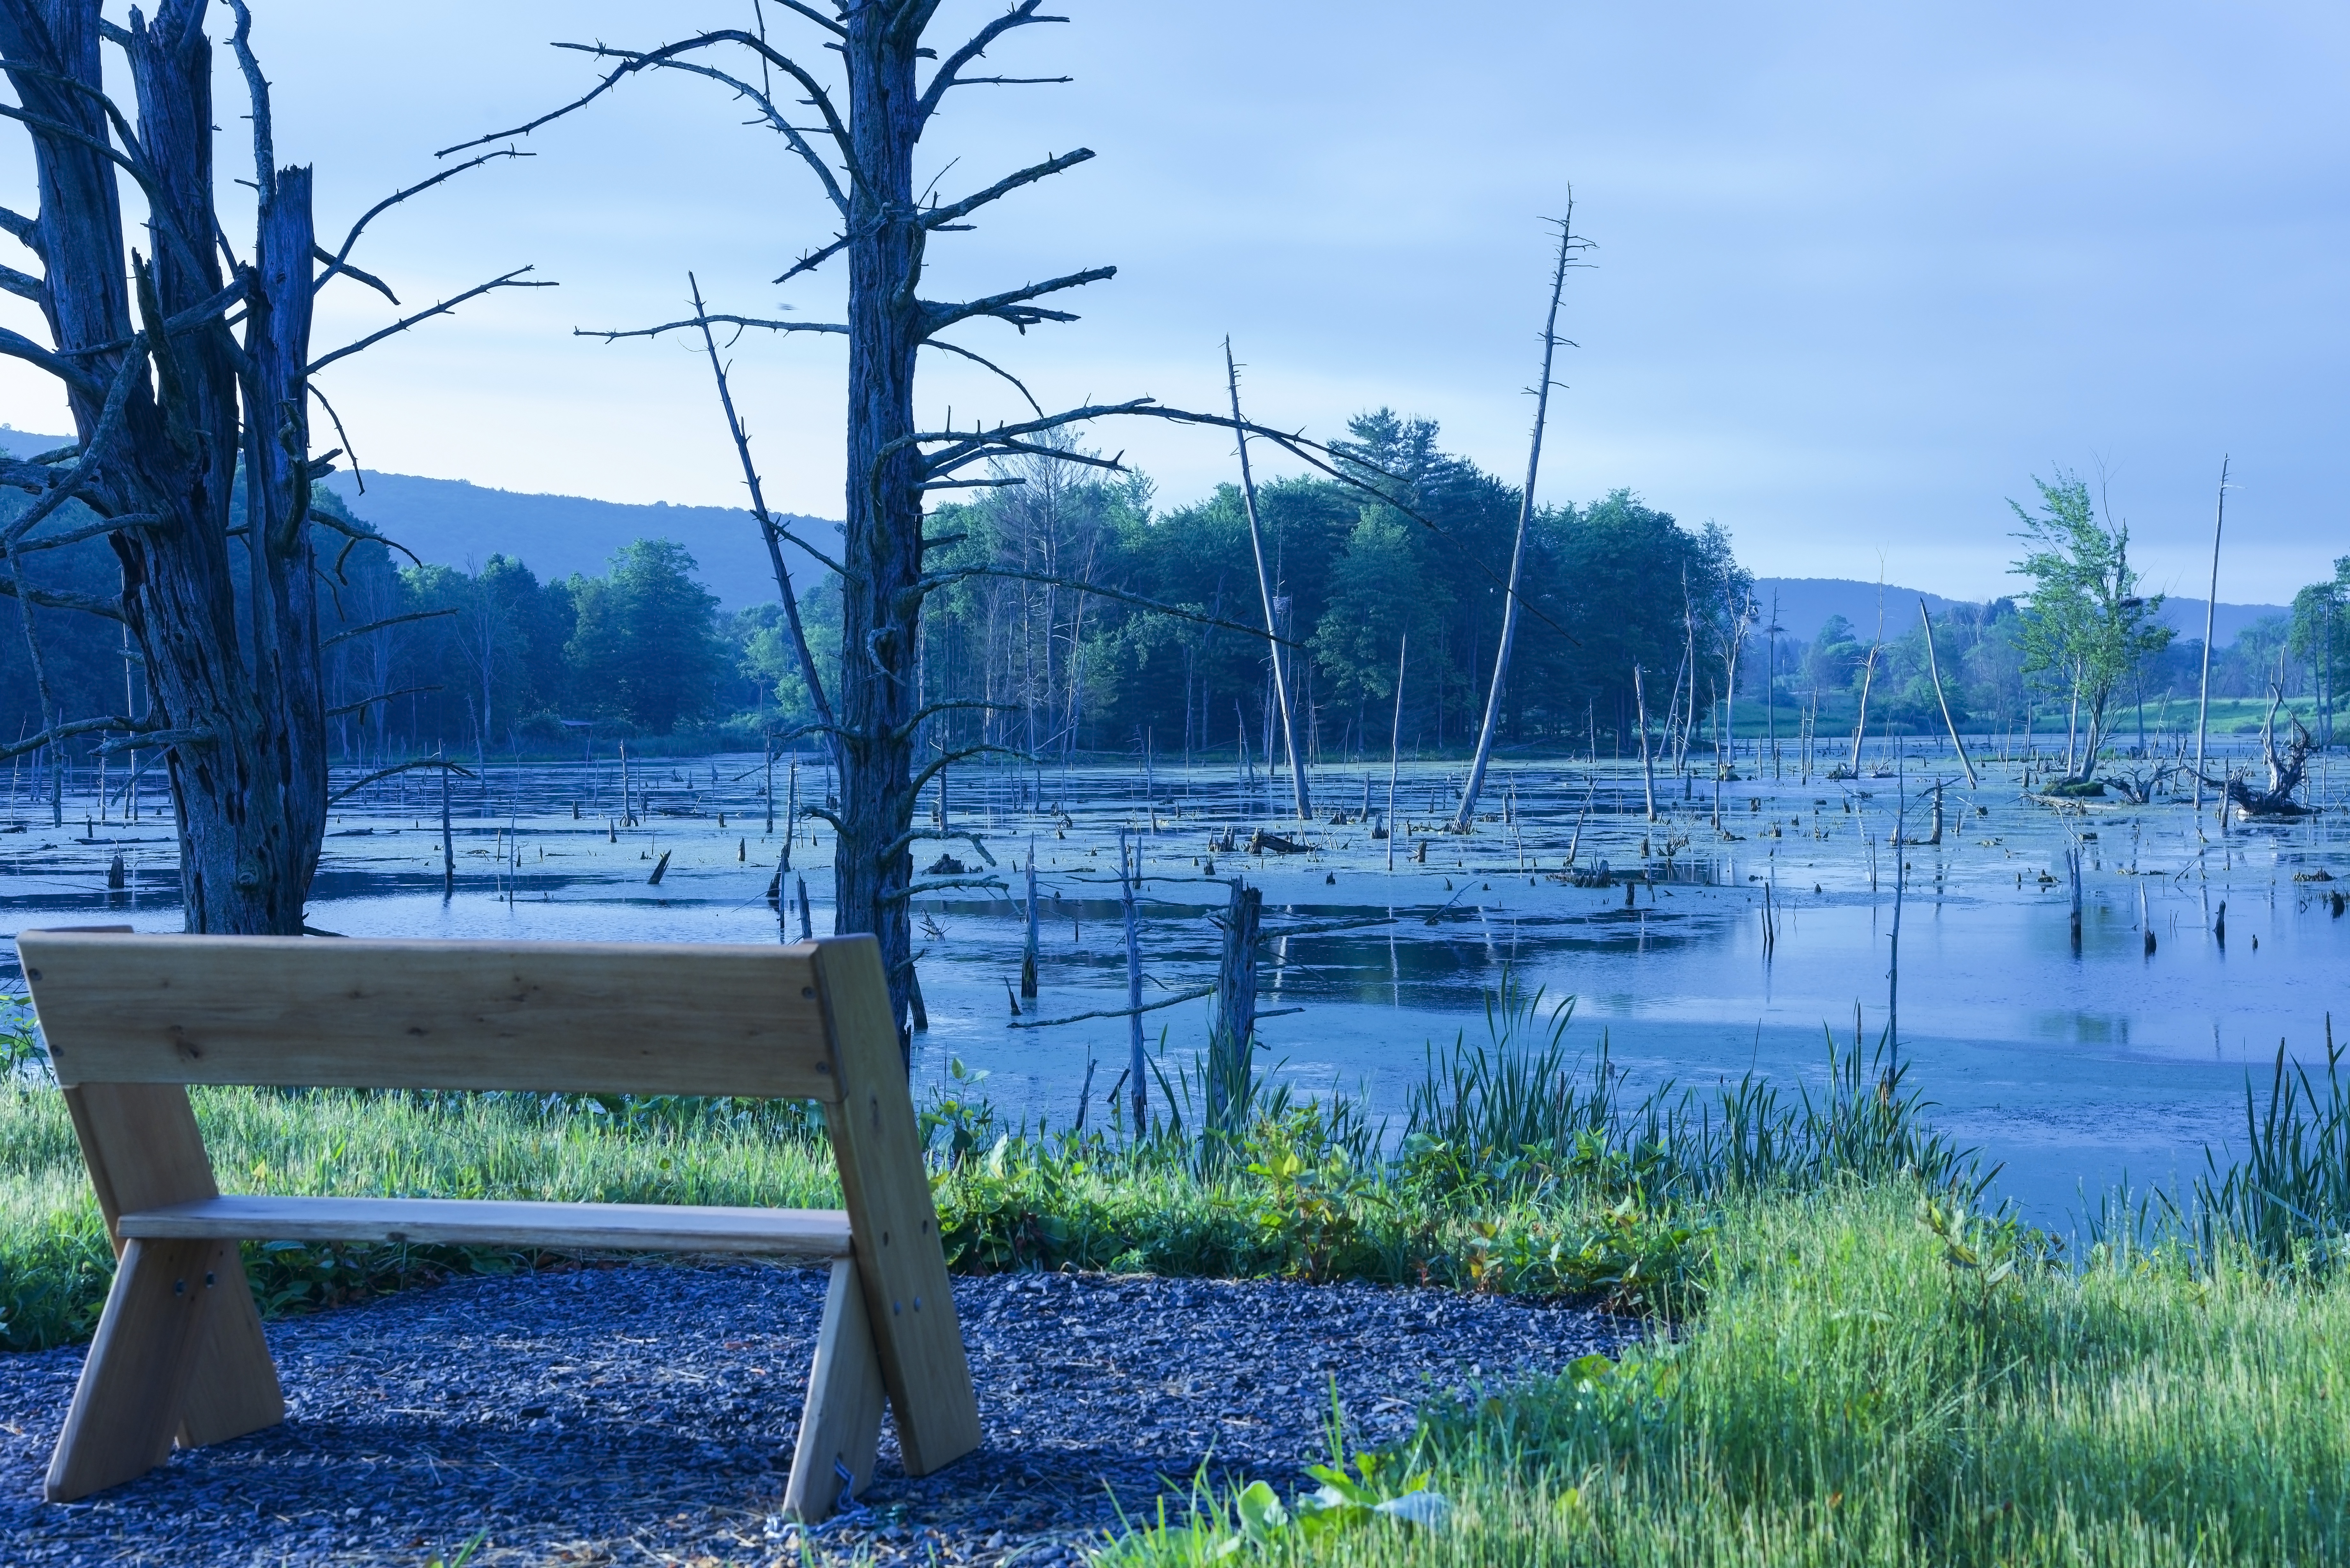 Lindsay-Parsons Wetland